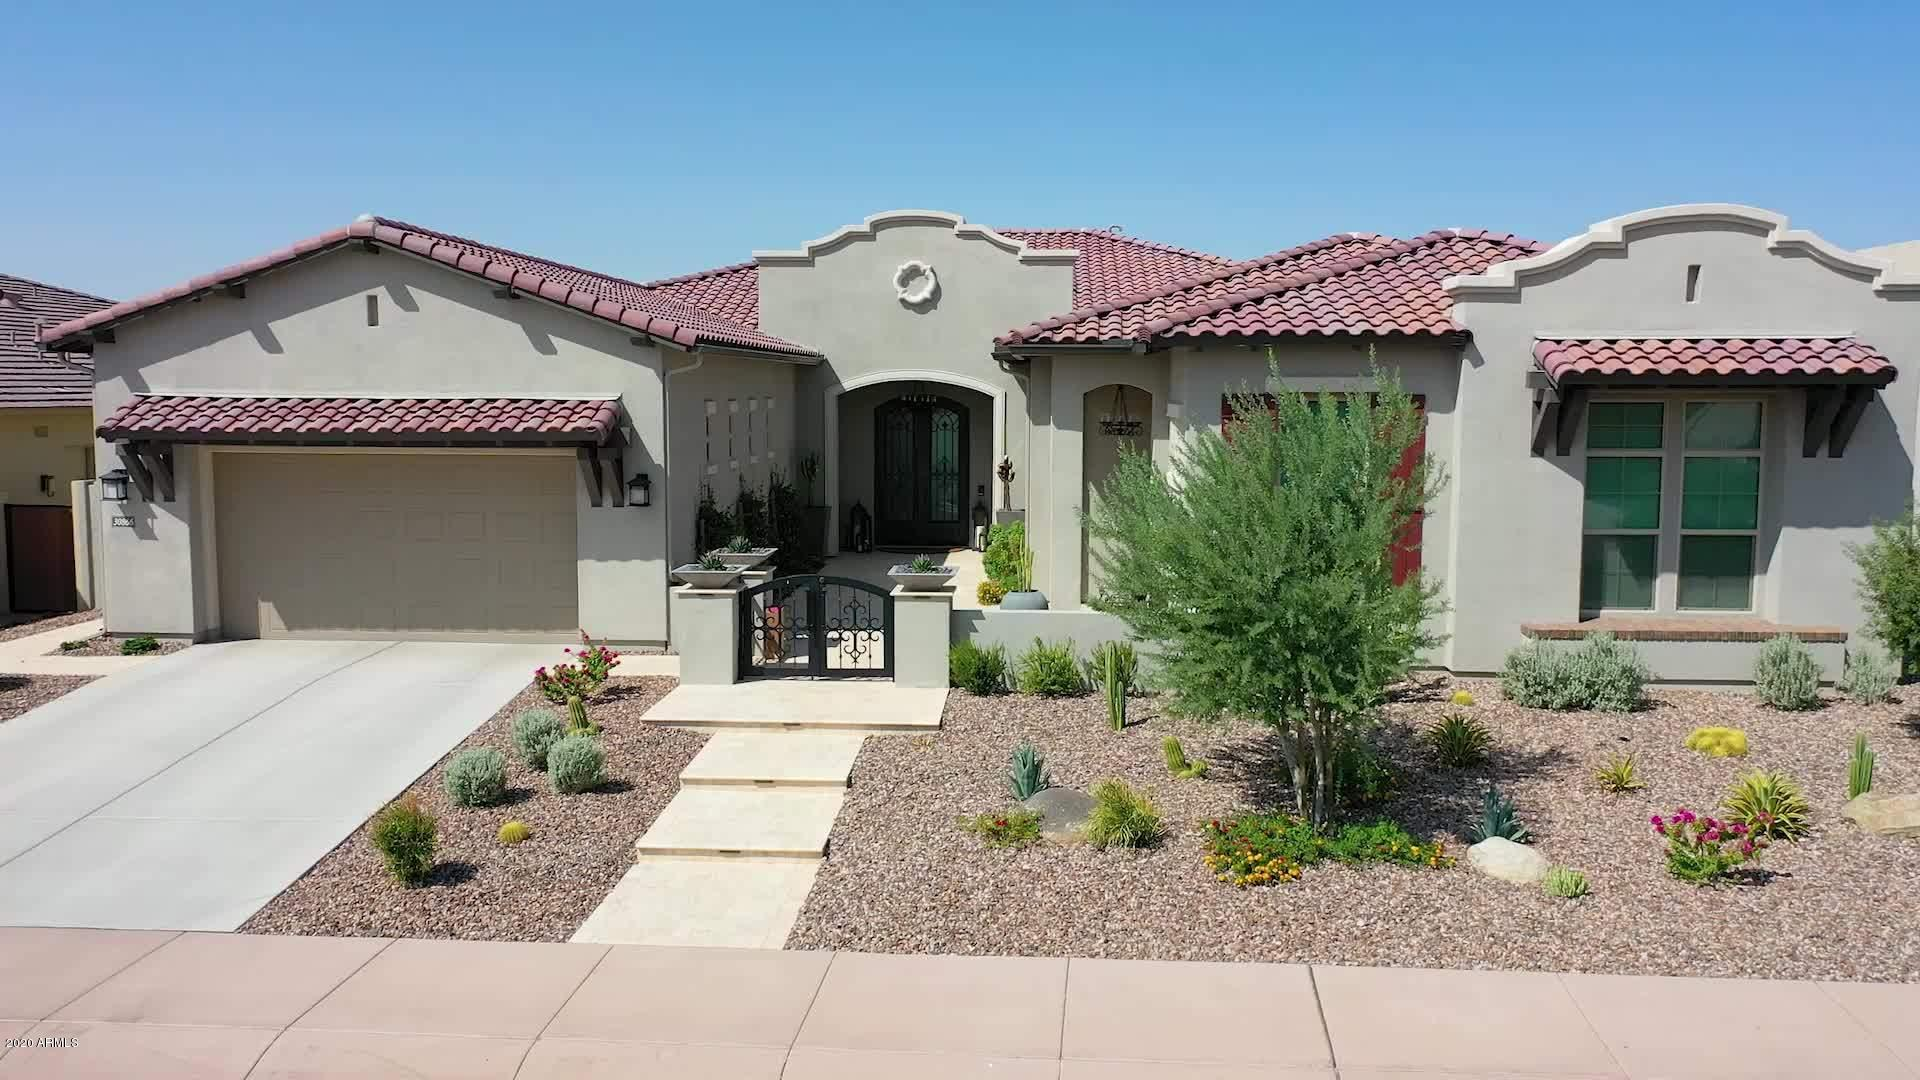 MLS 6133881 30866 N 117TH Drive, Peoria, AZ 85383 Peoria AZ Private Pool